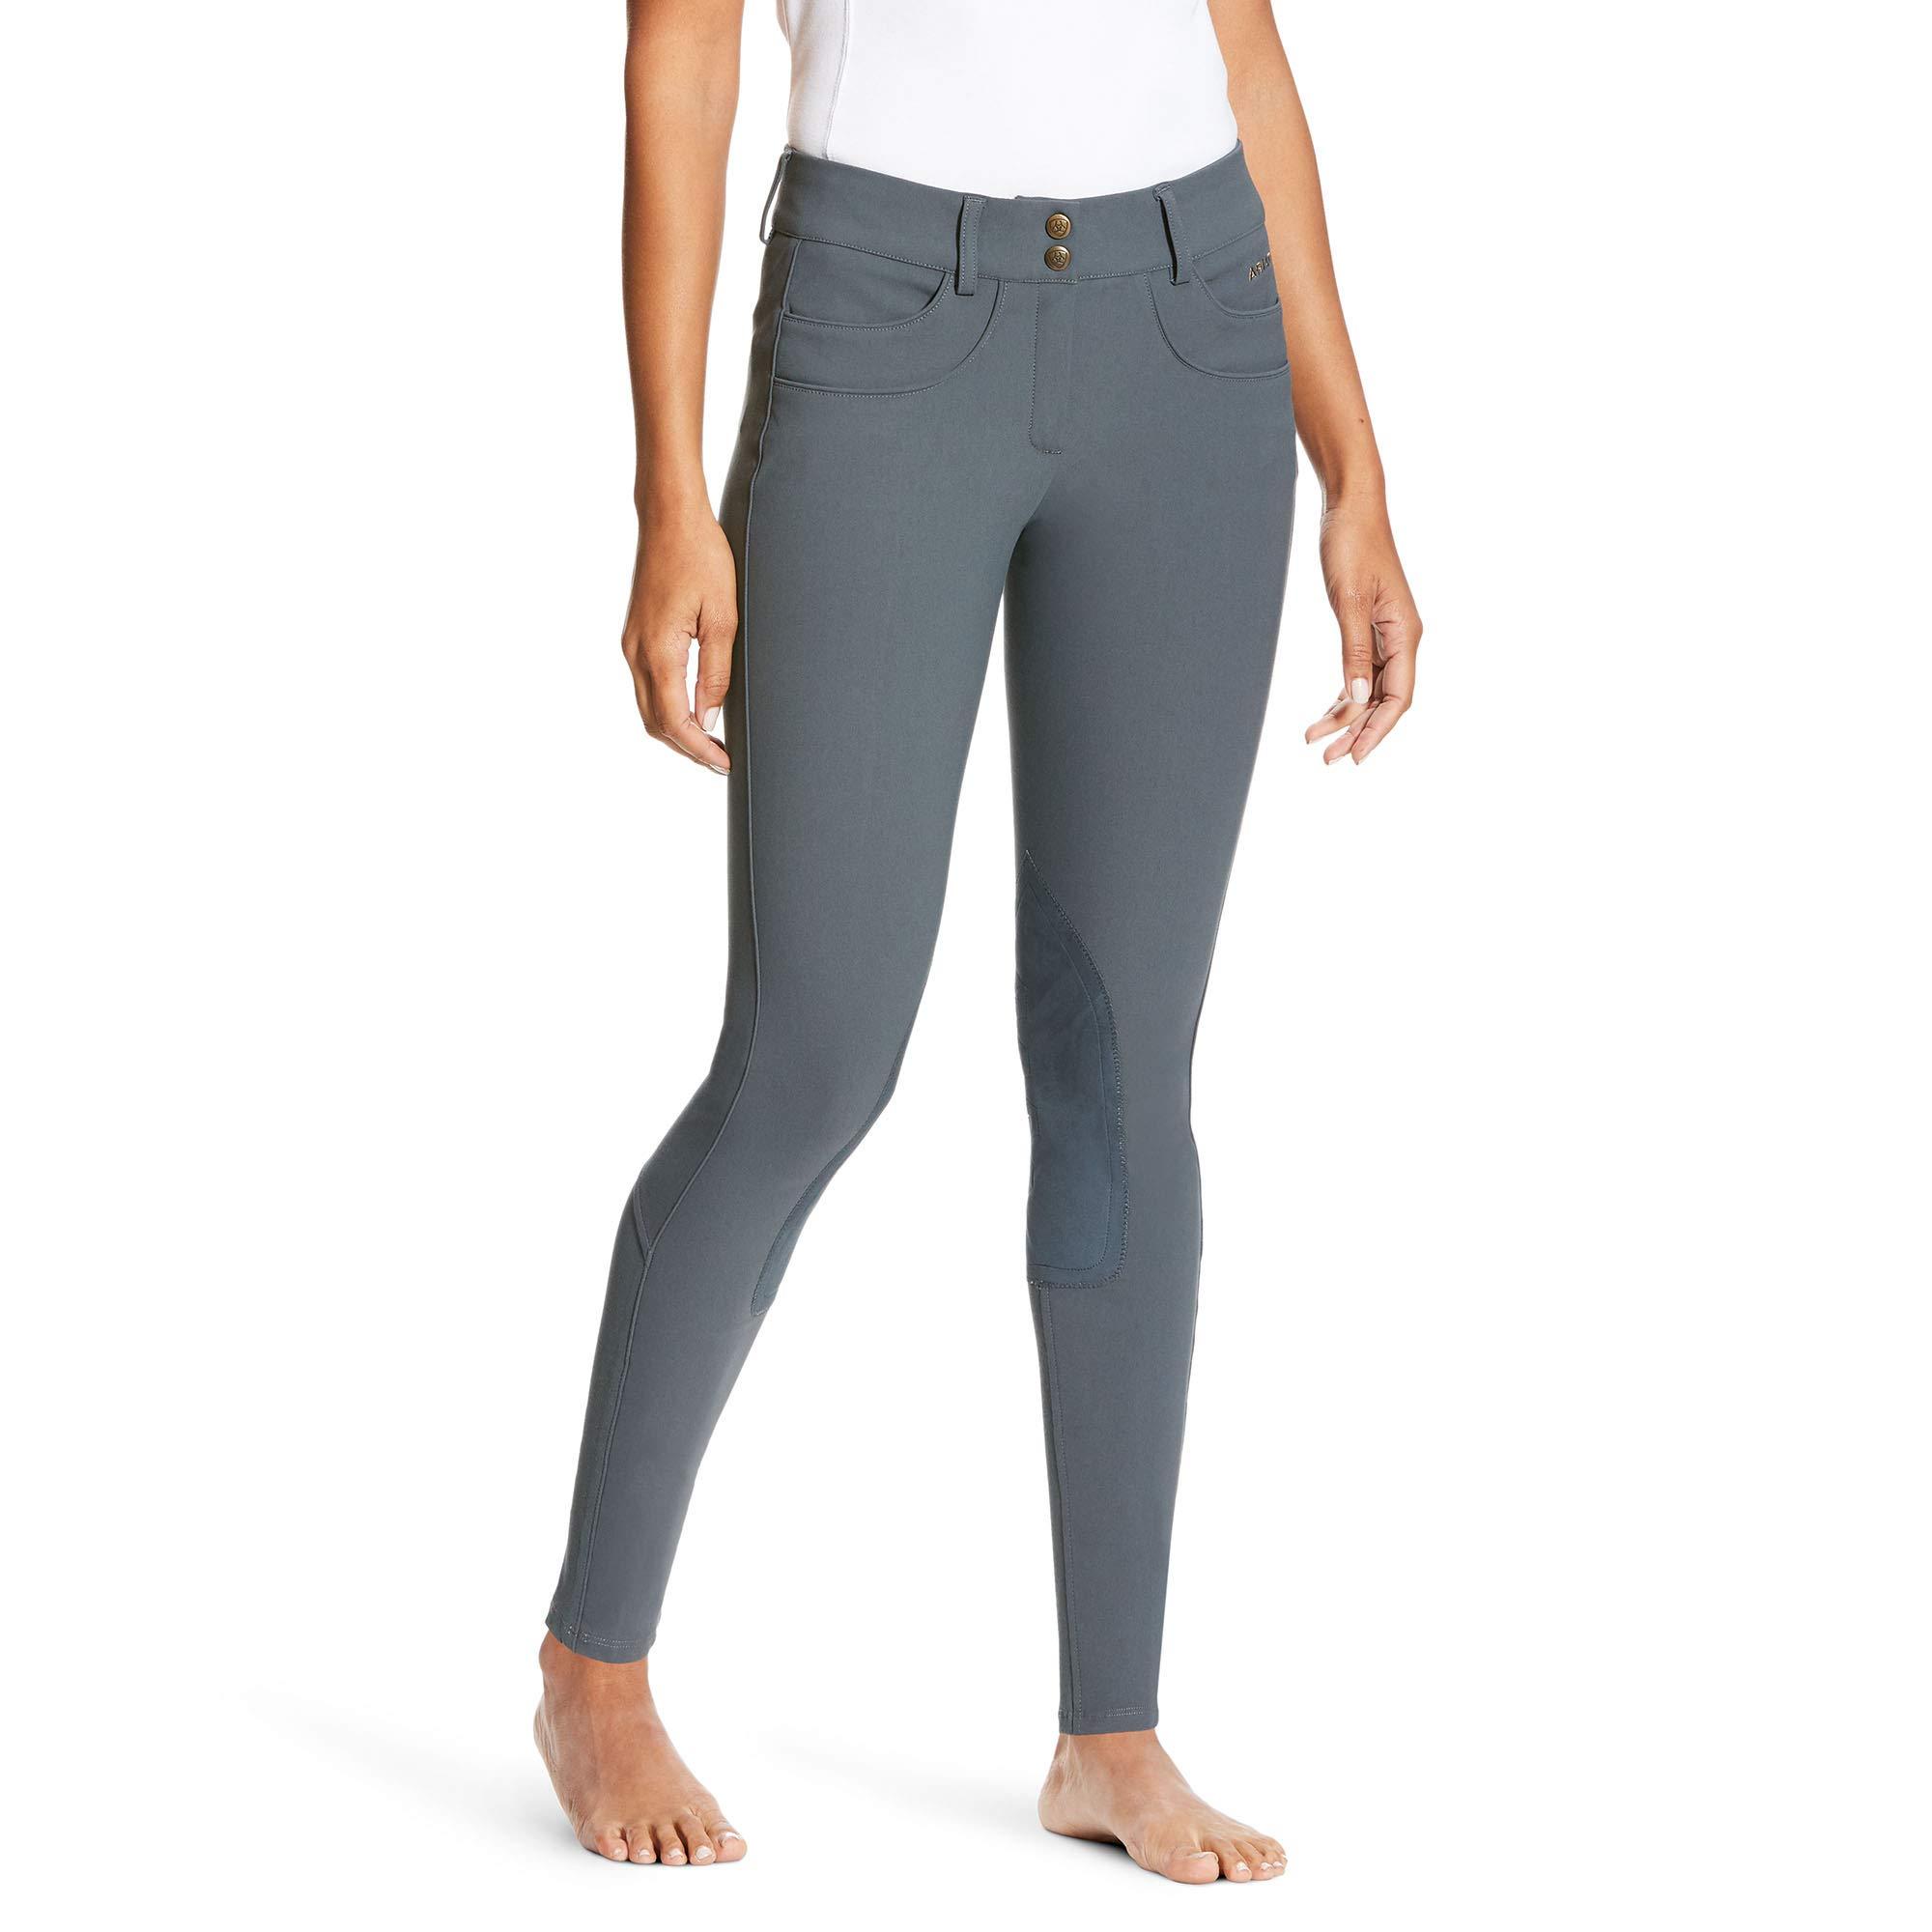 ARIAT Women's Olympia Low Rise Knee Patch Front Zip Knee Patch Breech Granite Size 24 Regular